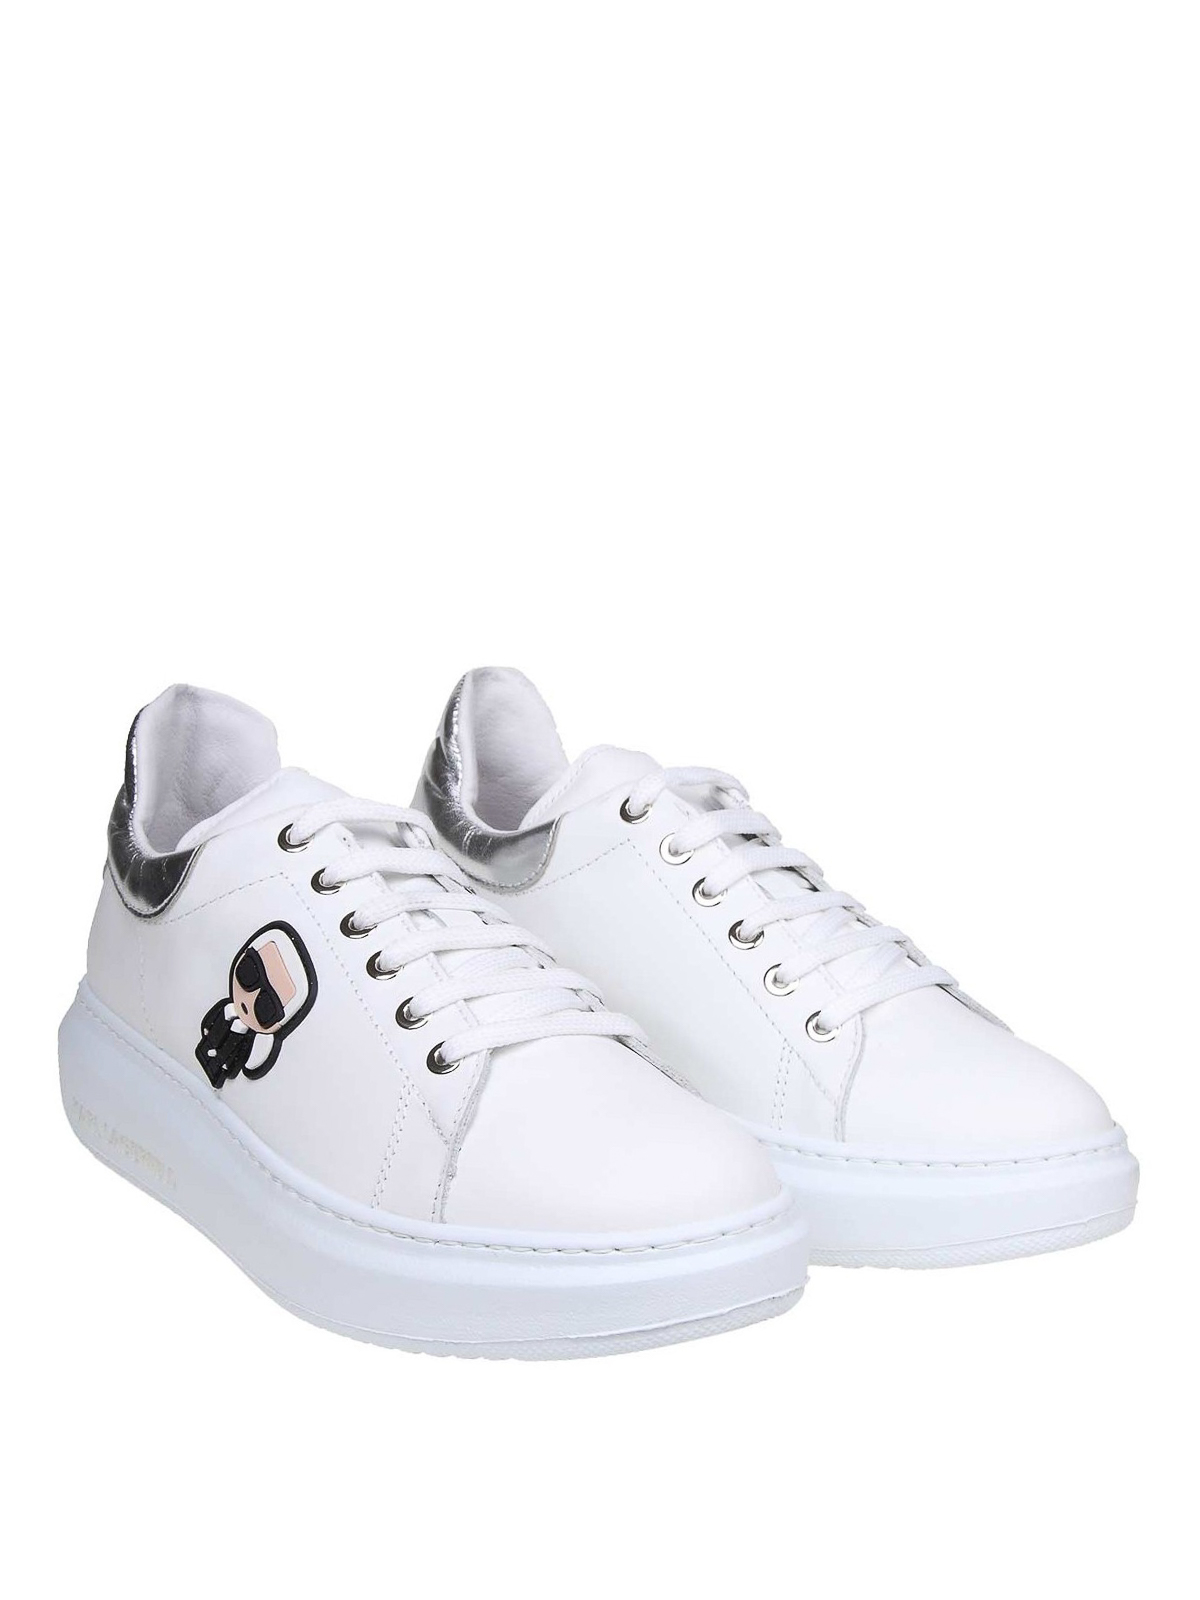 Karl Lagerfeld - Karl patch white